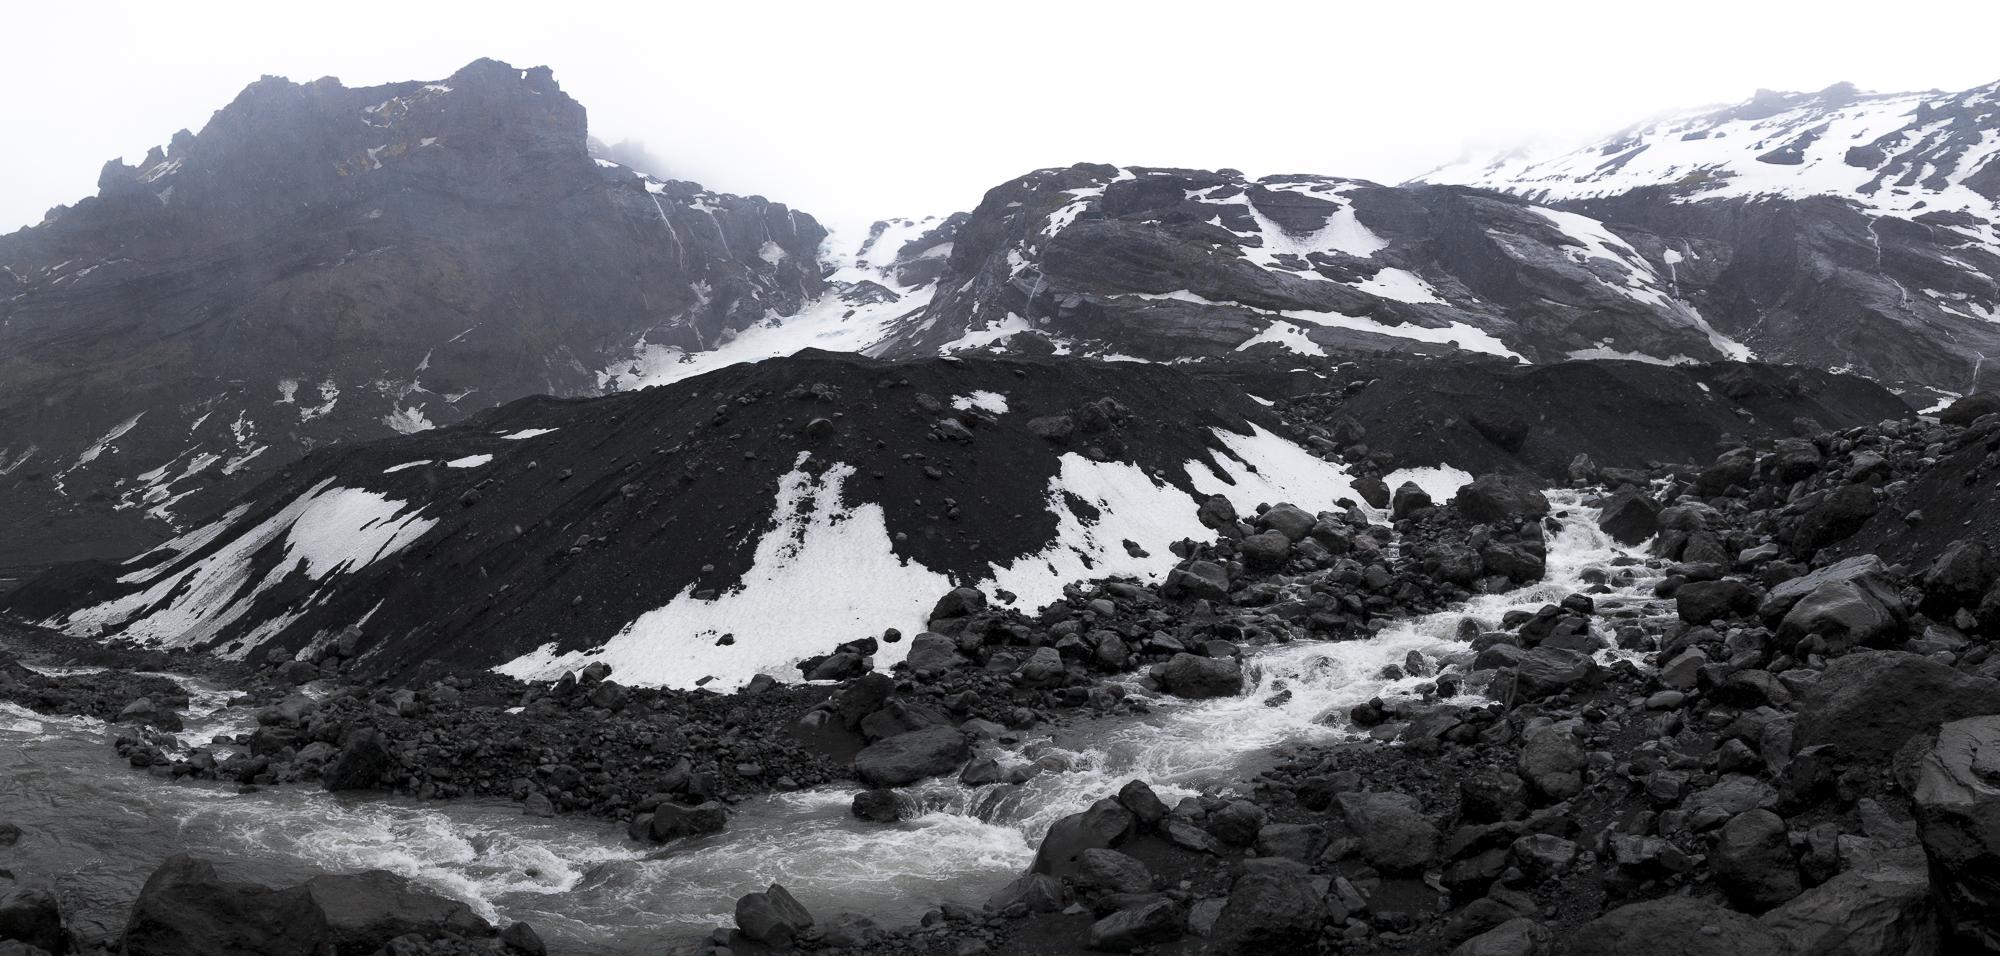 Ankit_Iceland-8889-Pano-2.jpg